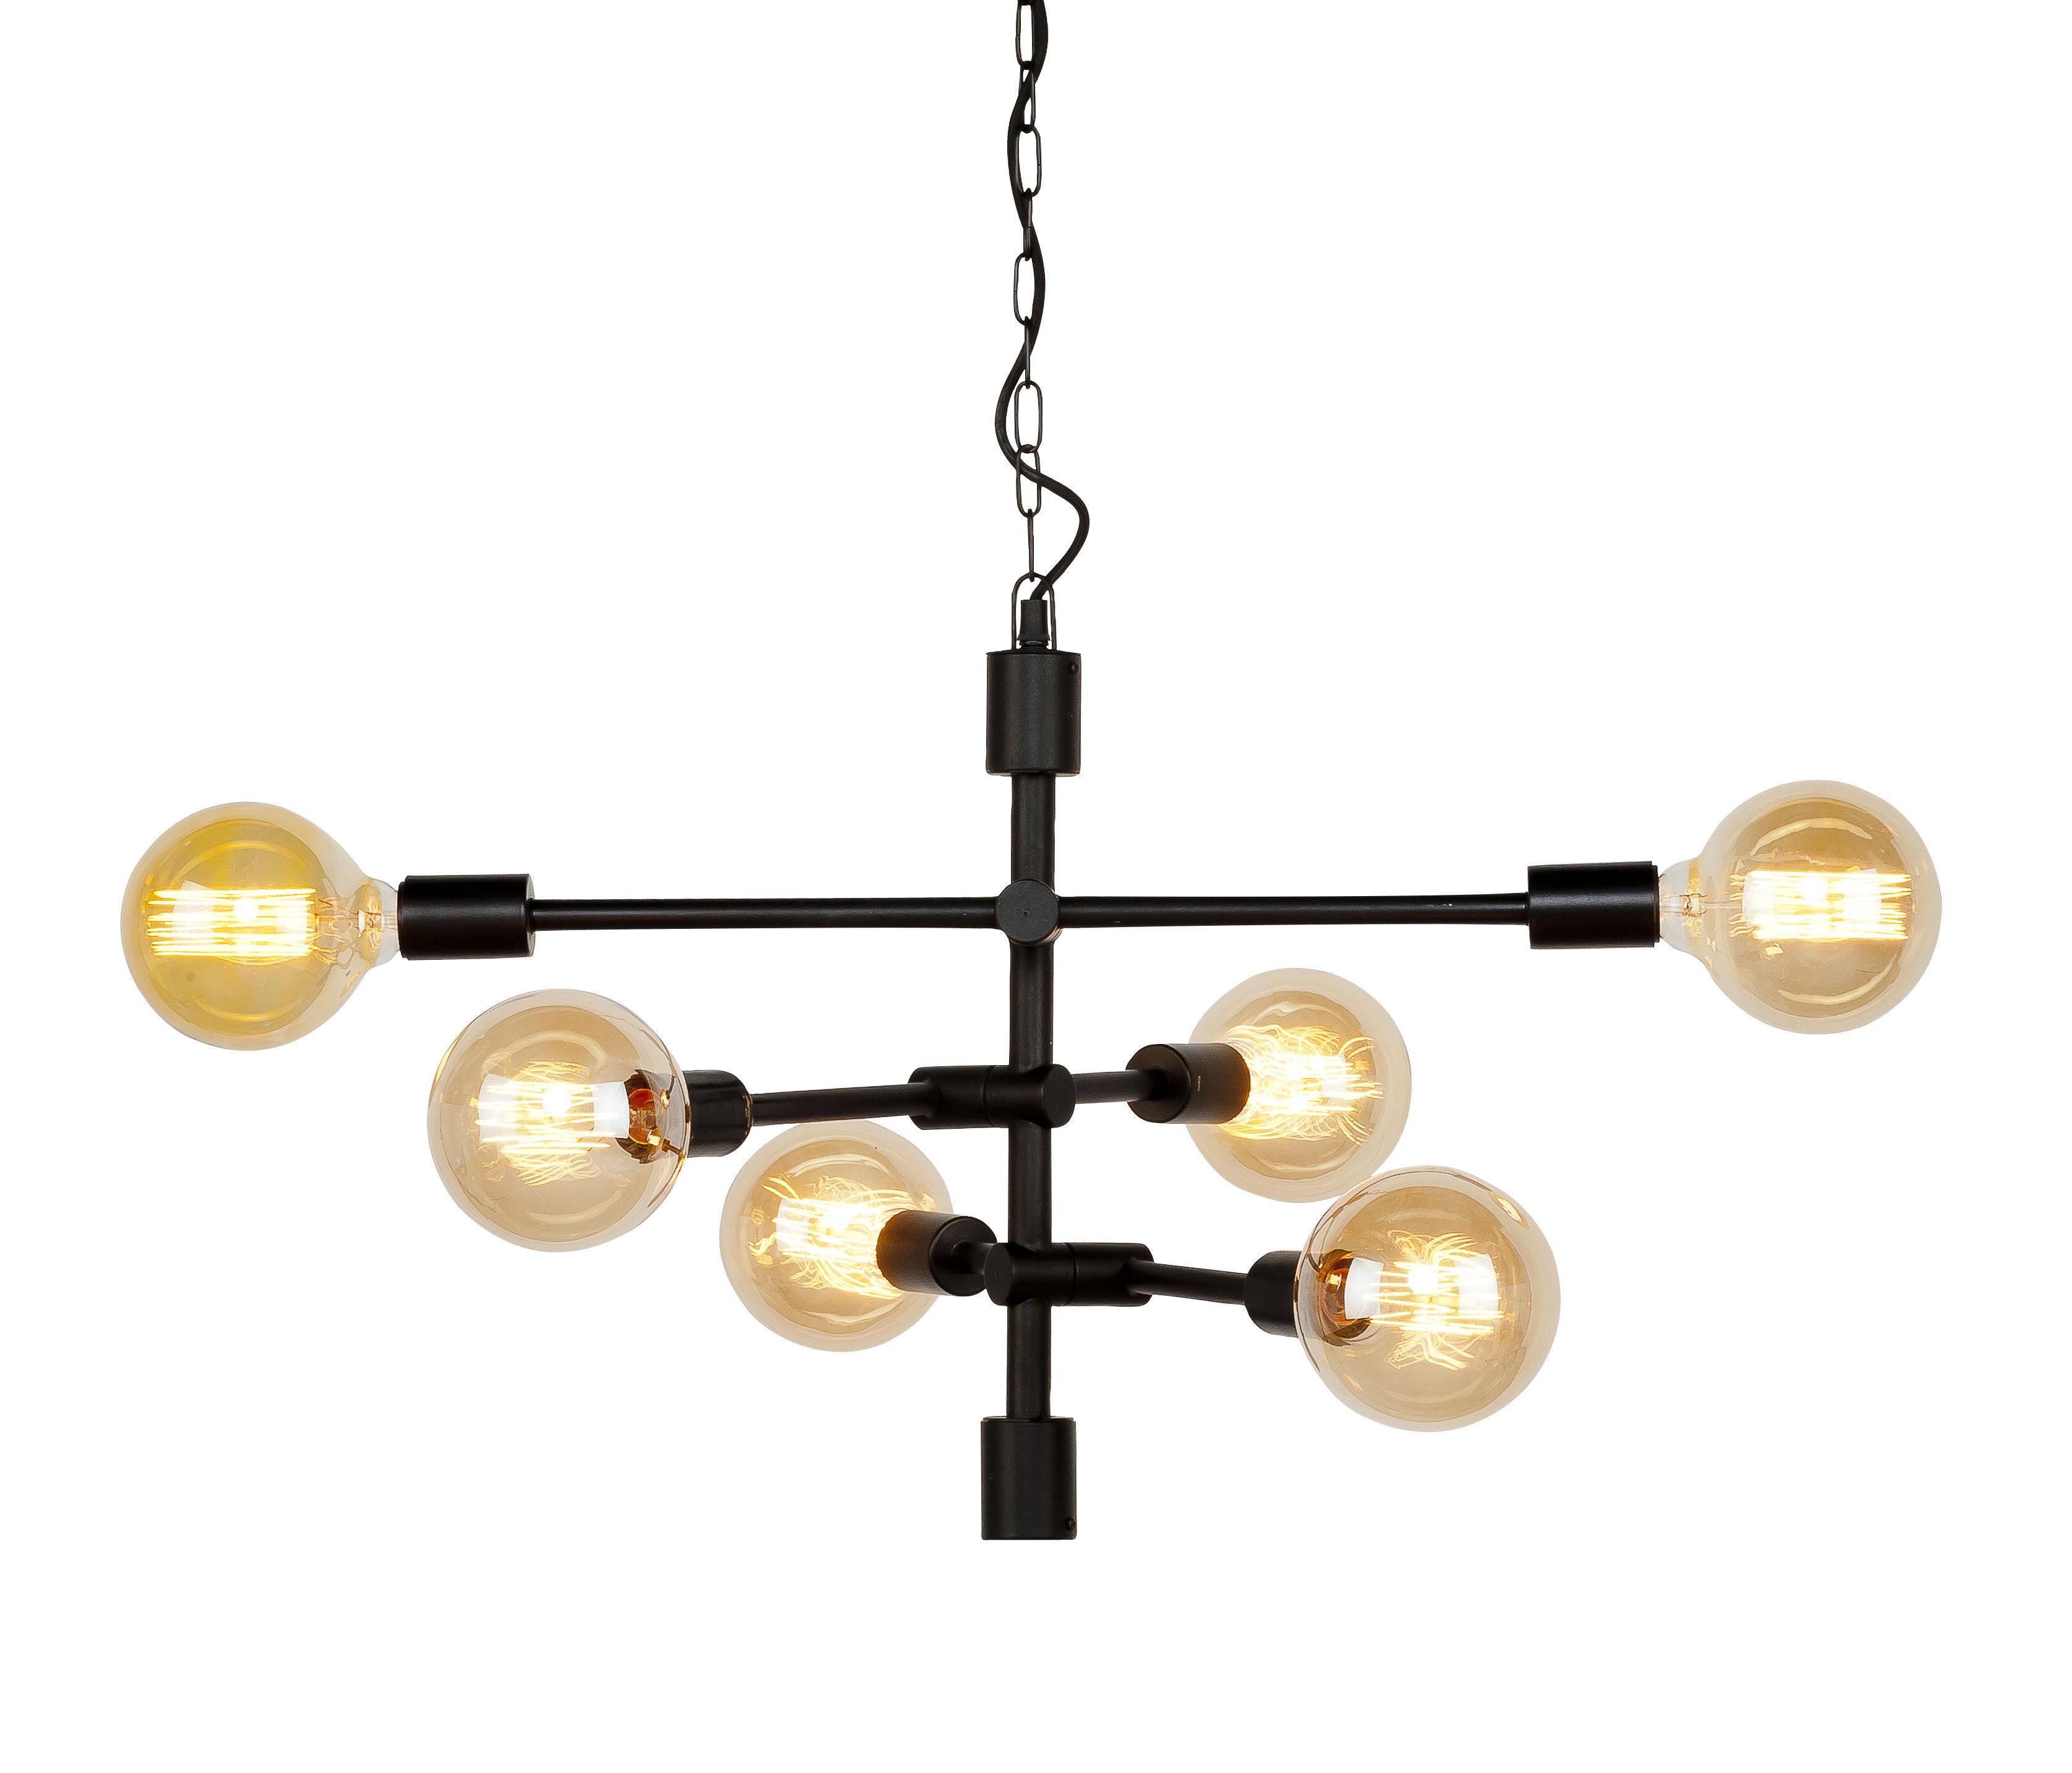 Lighting - Pendant Lighting - Nashville Pendant - / L 60 cm by It's about Romi - Black - Painted iron